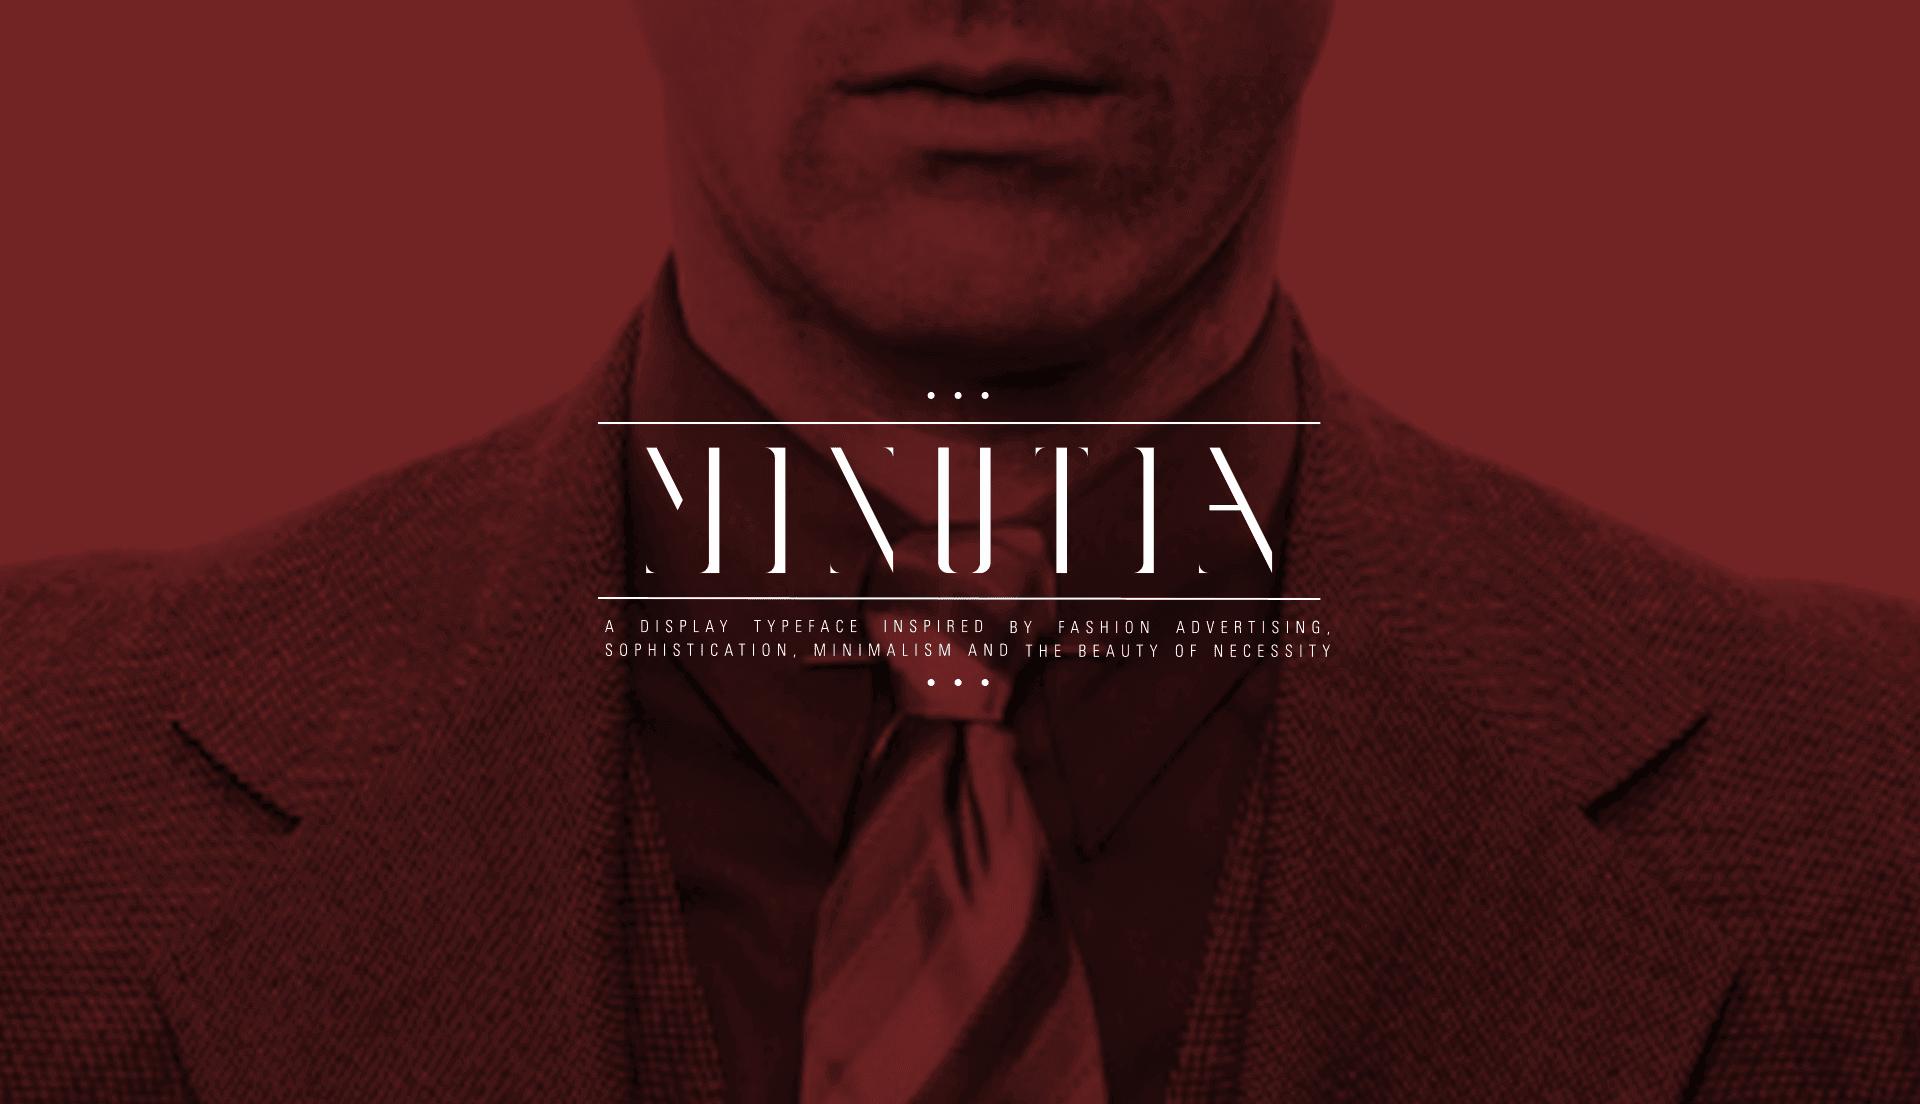 minutia-cover